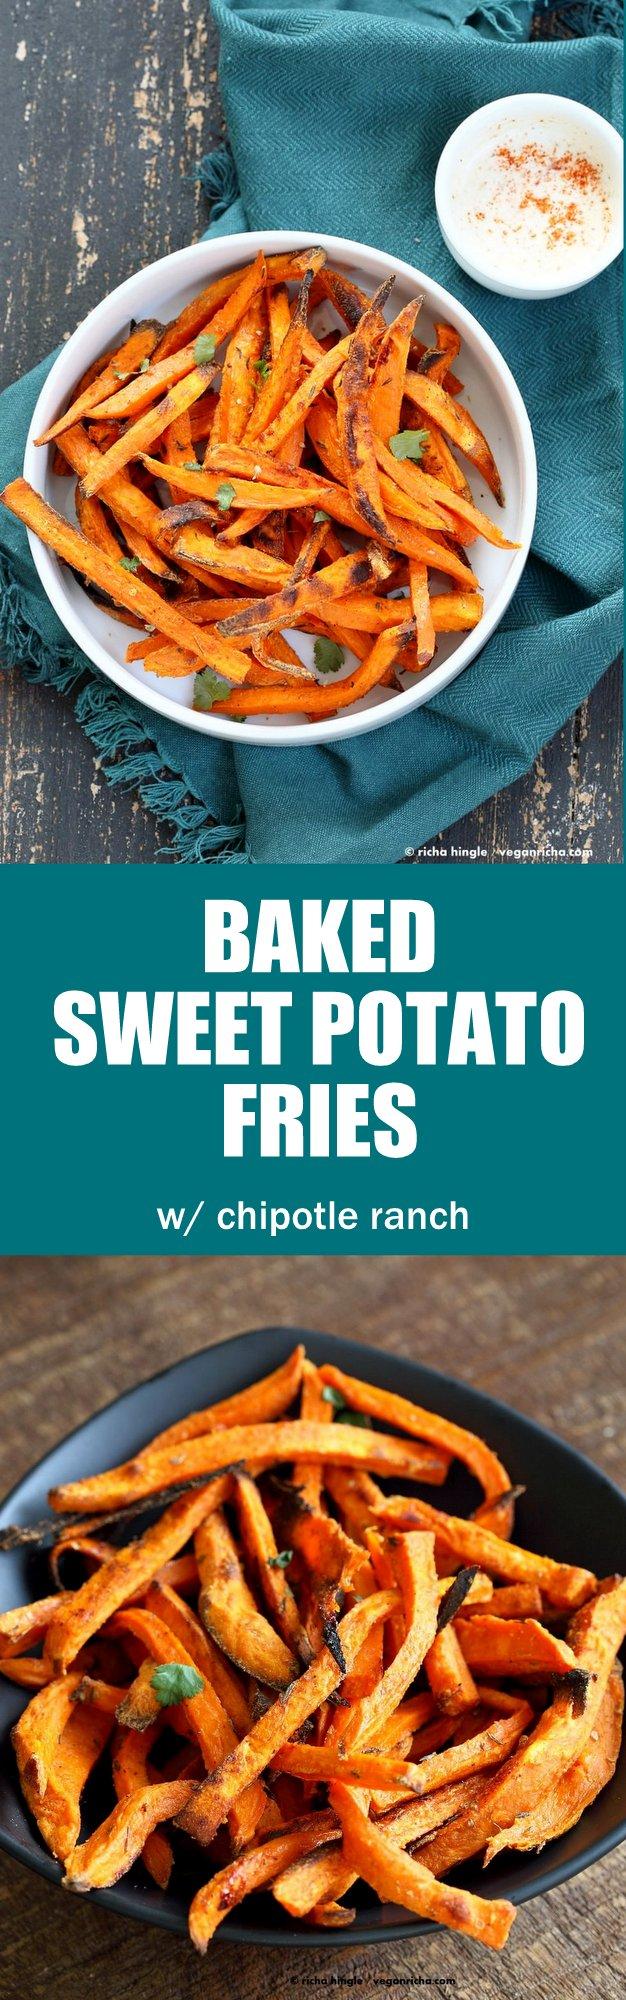 Baked Sweet Potato Fries with Vegan Chipotle Ranch. Easy Crisp Sweet Potato Fries served with dairy free ranch. VeganRicha.com #Vegan #Appetizer #Recipe #Glutenfree #Soyfree